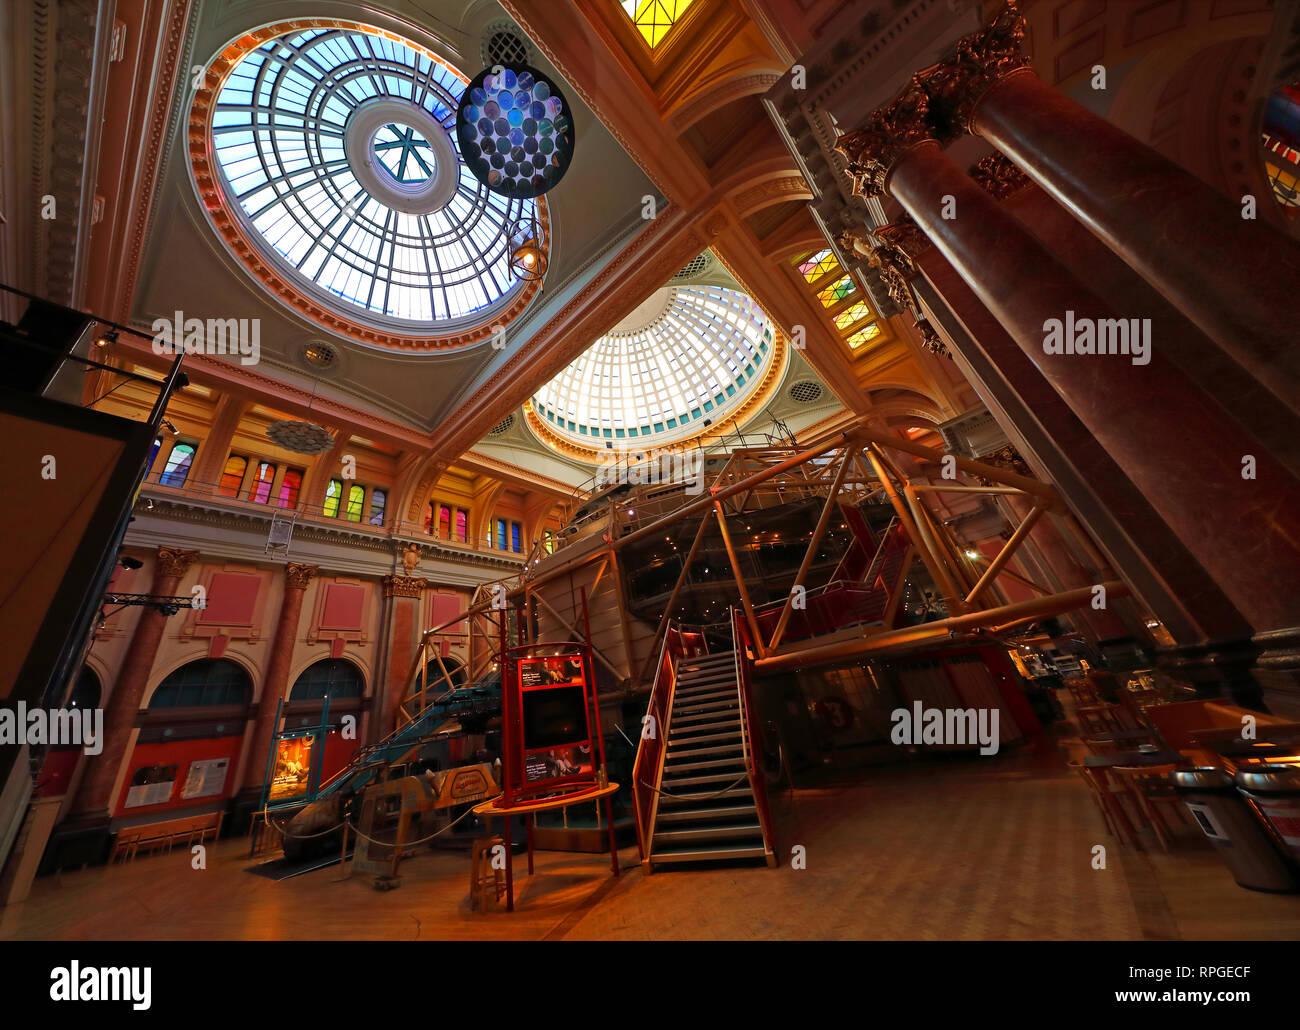 Teatro Royal Exchange Theatre, St Anns Sq, Manchester, Inglaterra, Reino Unido, M2 7DH Foto de stock